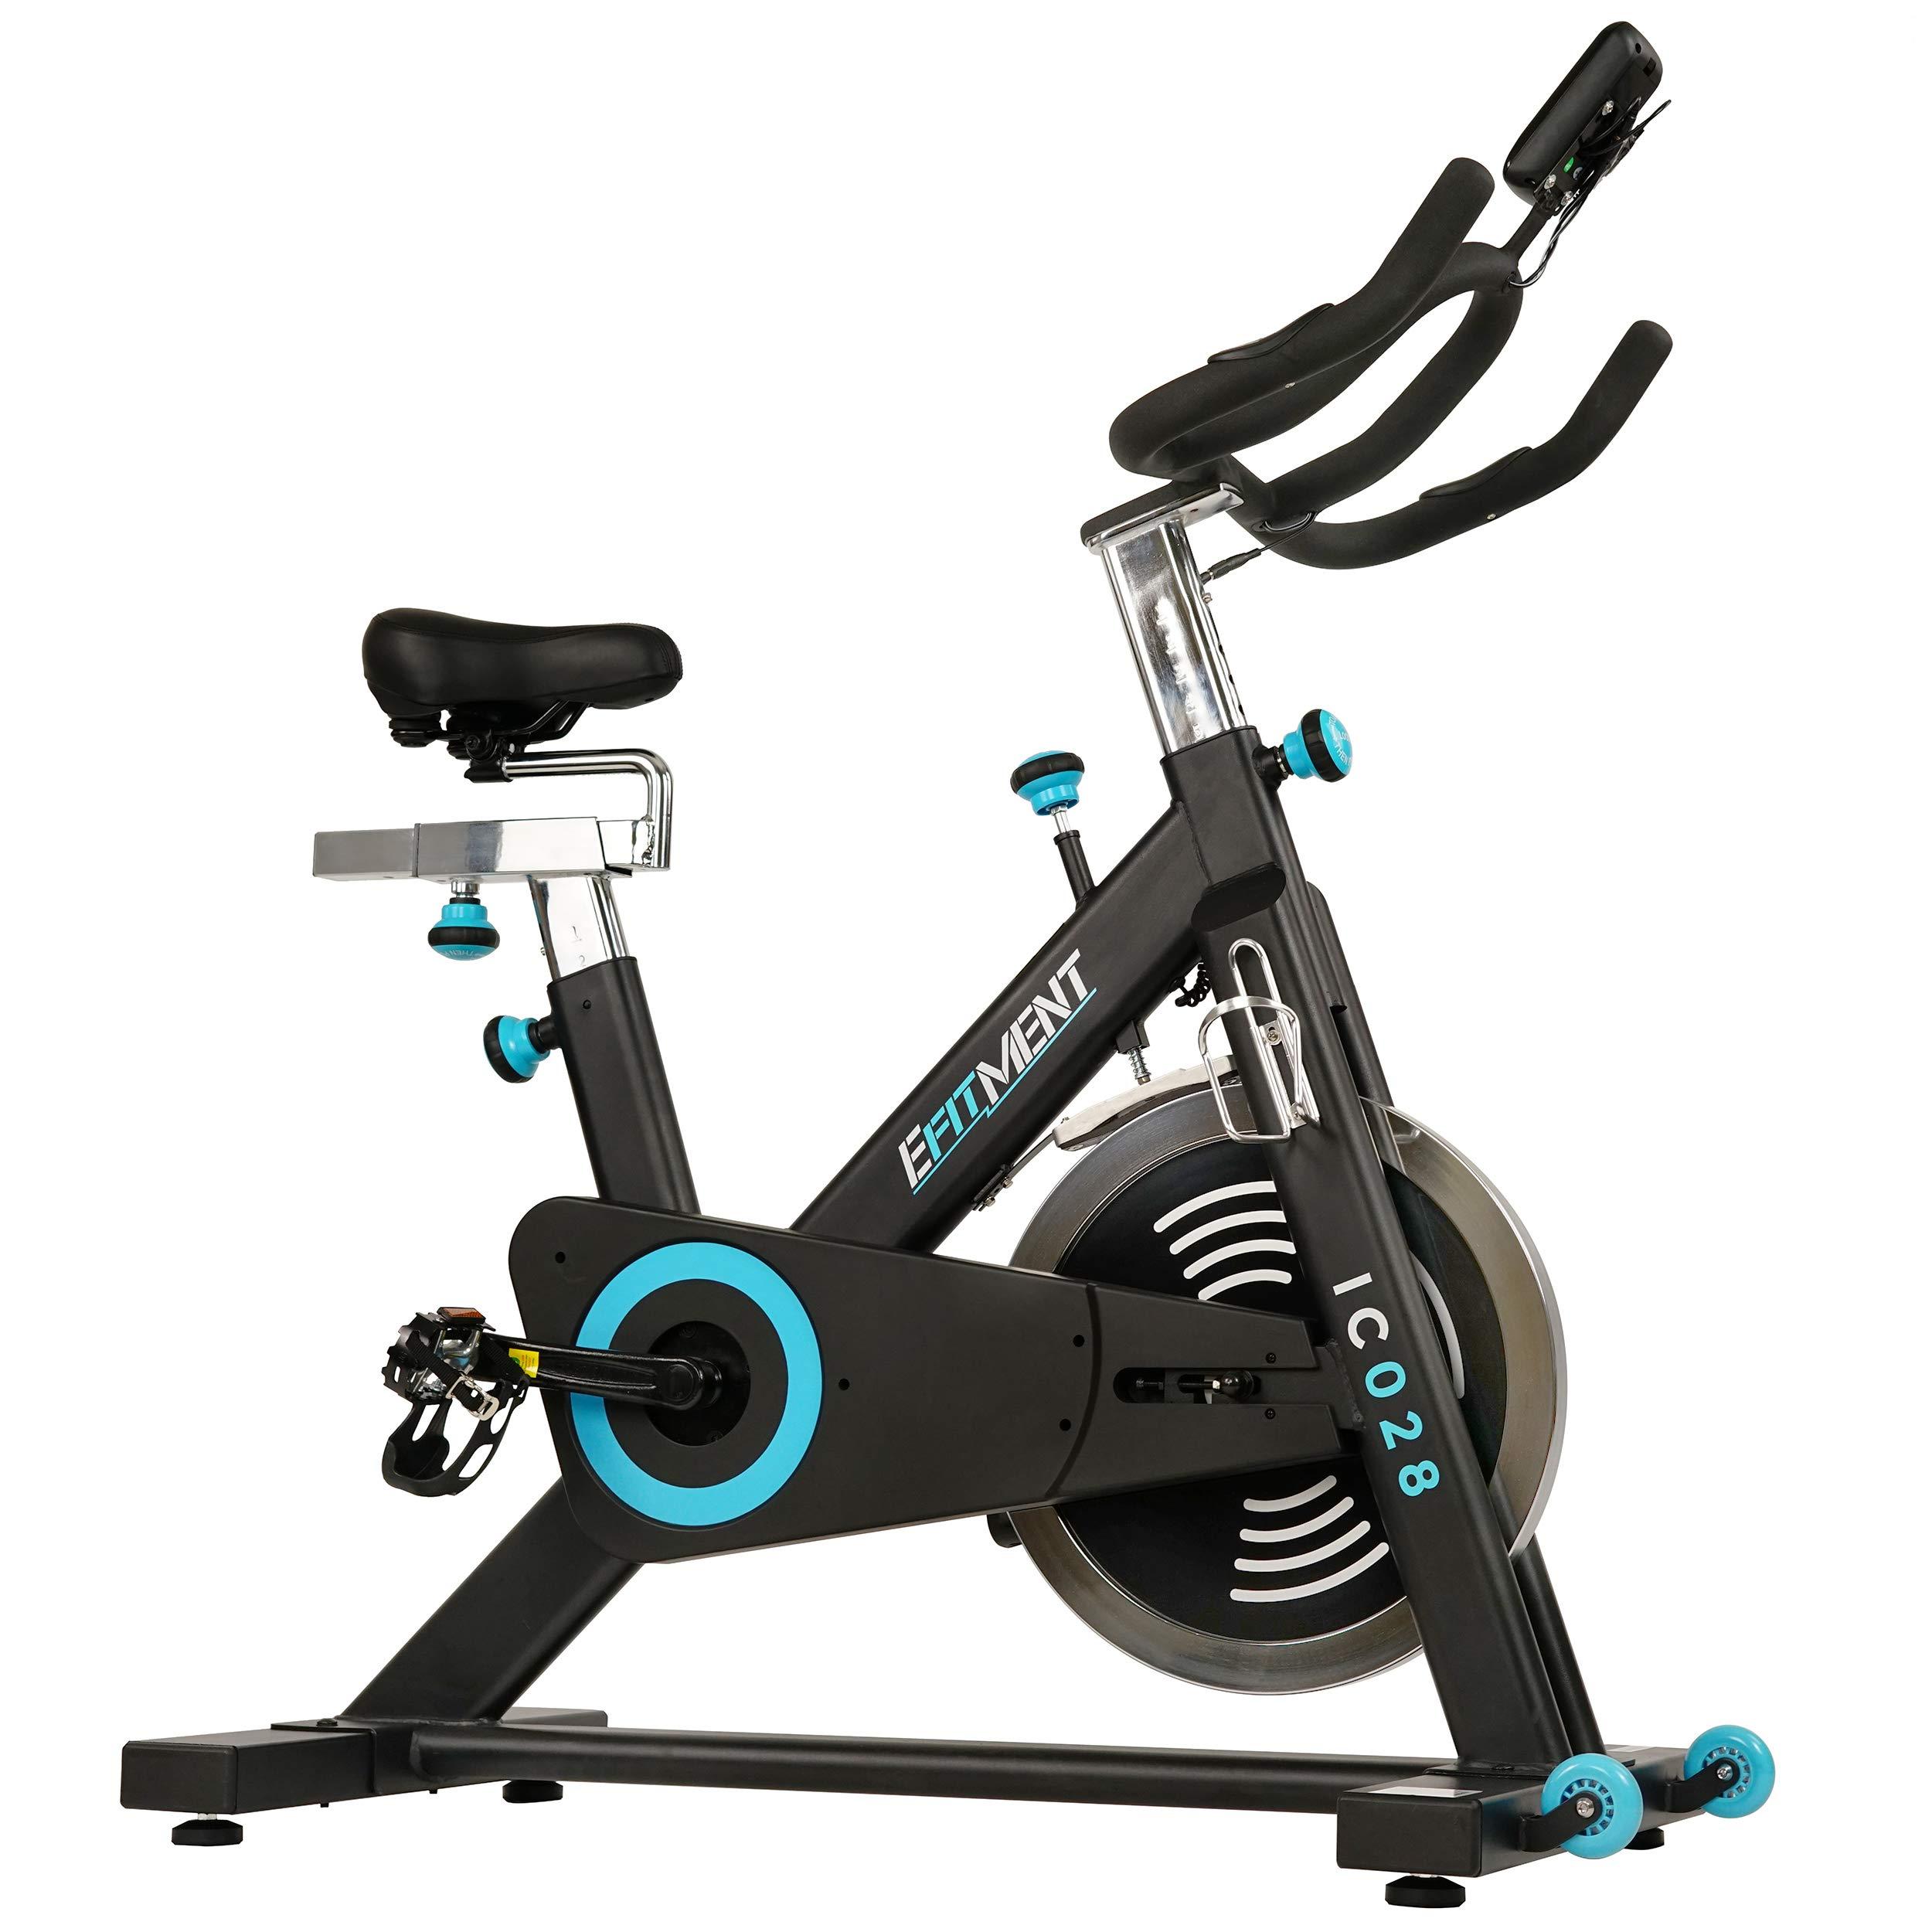 EFITMENT Pro Belt Drive Indoor Cycle Bike - IC028